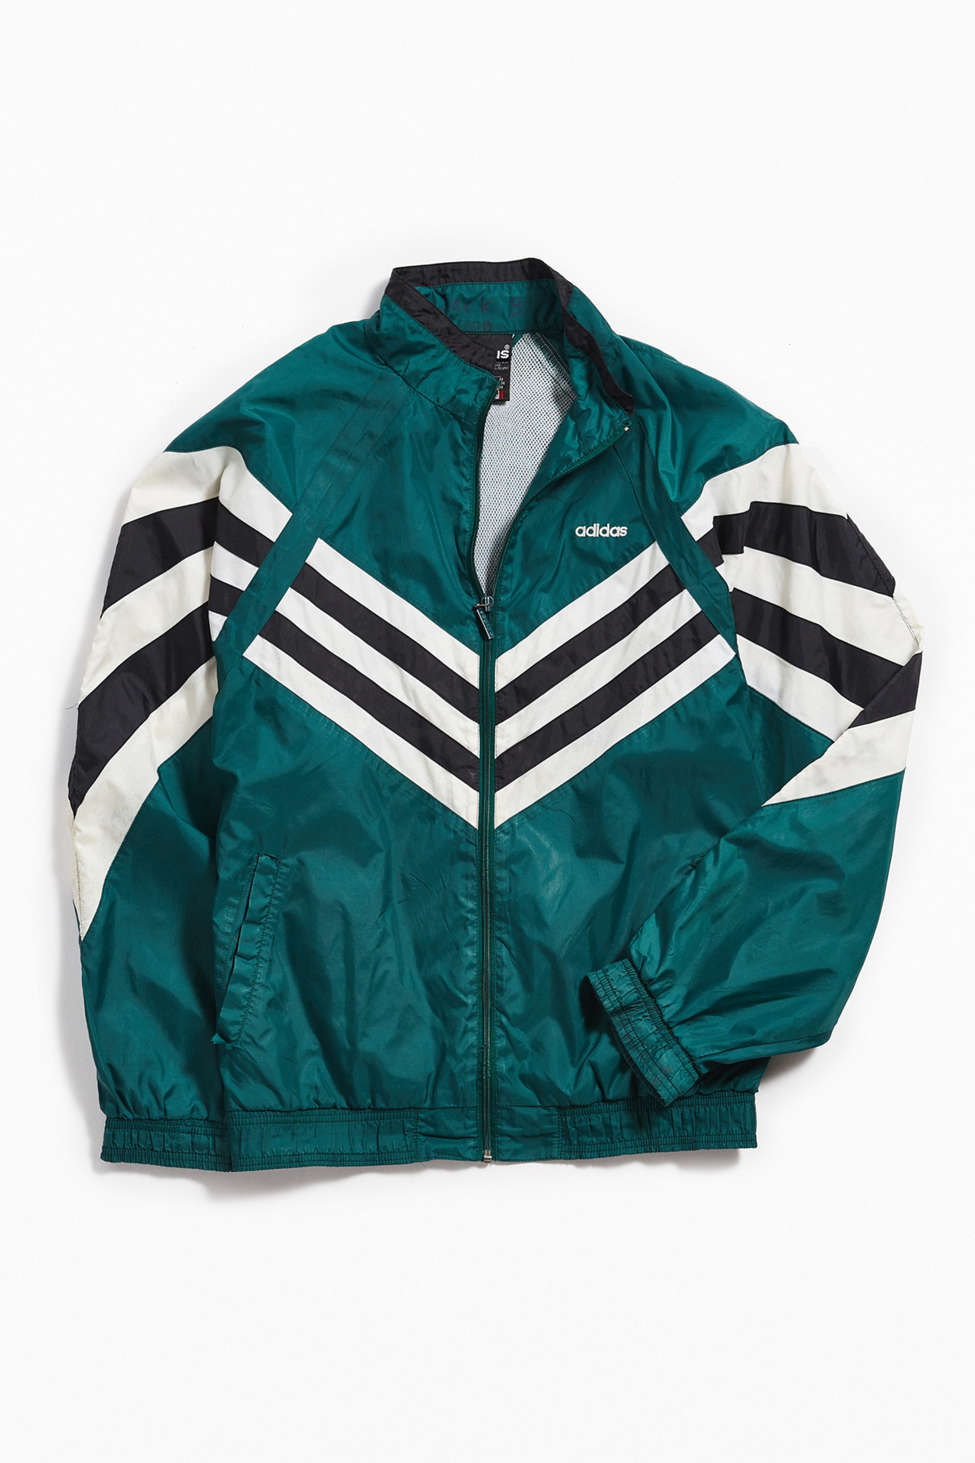 Vintage Adidas Green White Windbreaker Jacket Urban Outfitters